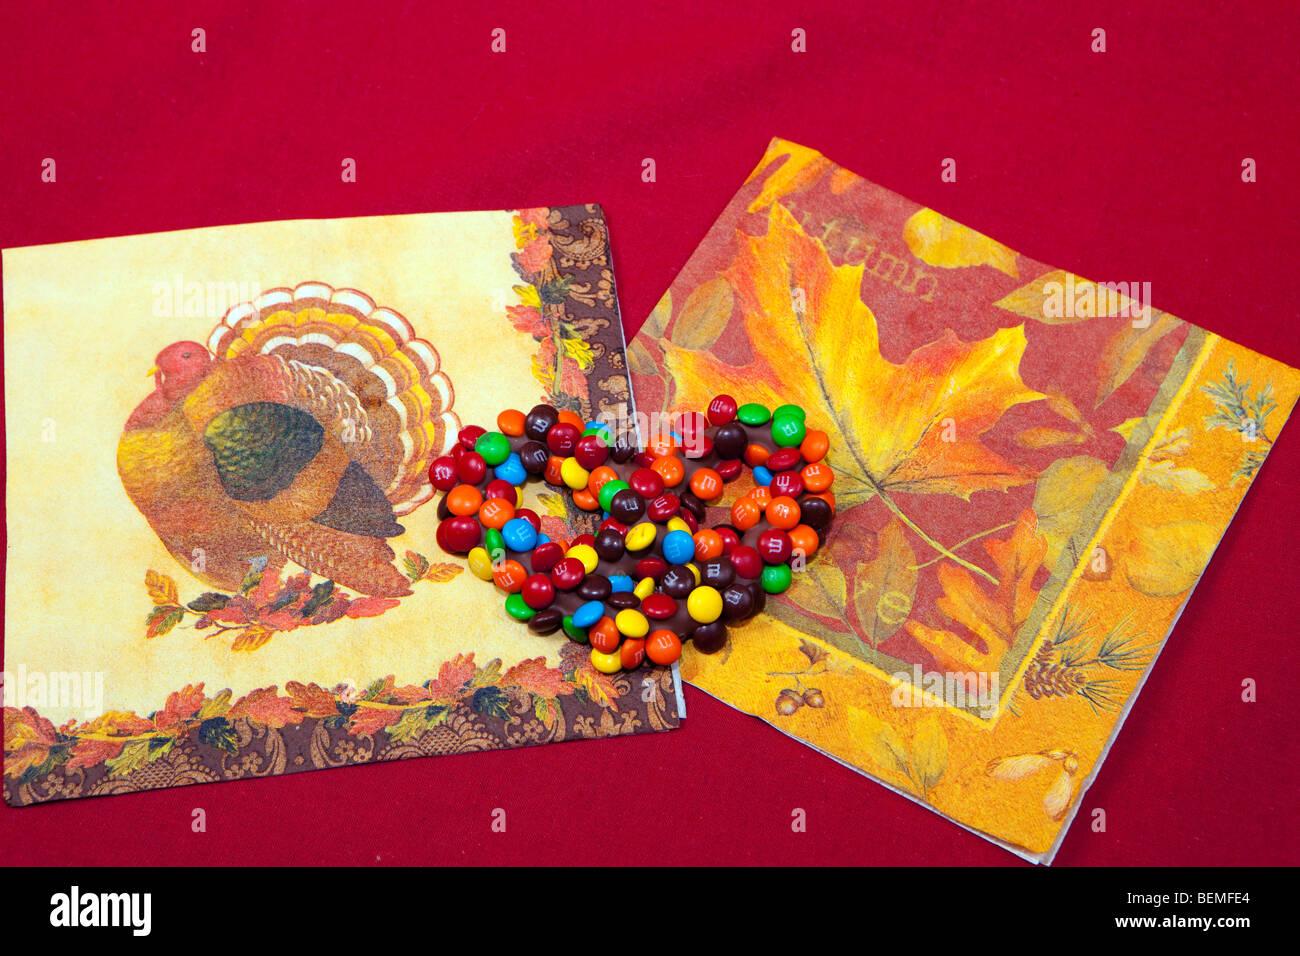 Pretzel Napkins Stockfotos & Pretzel Napkins Bilder - Alamy